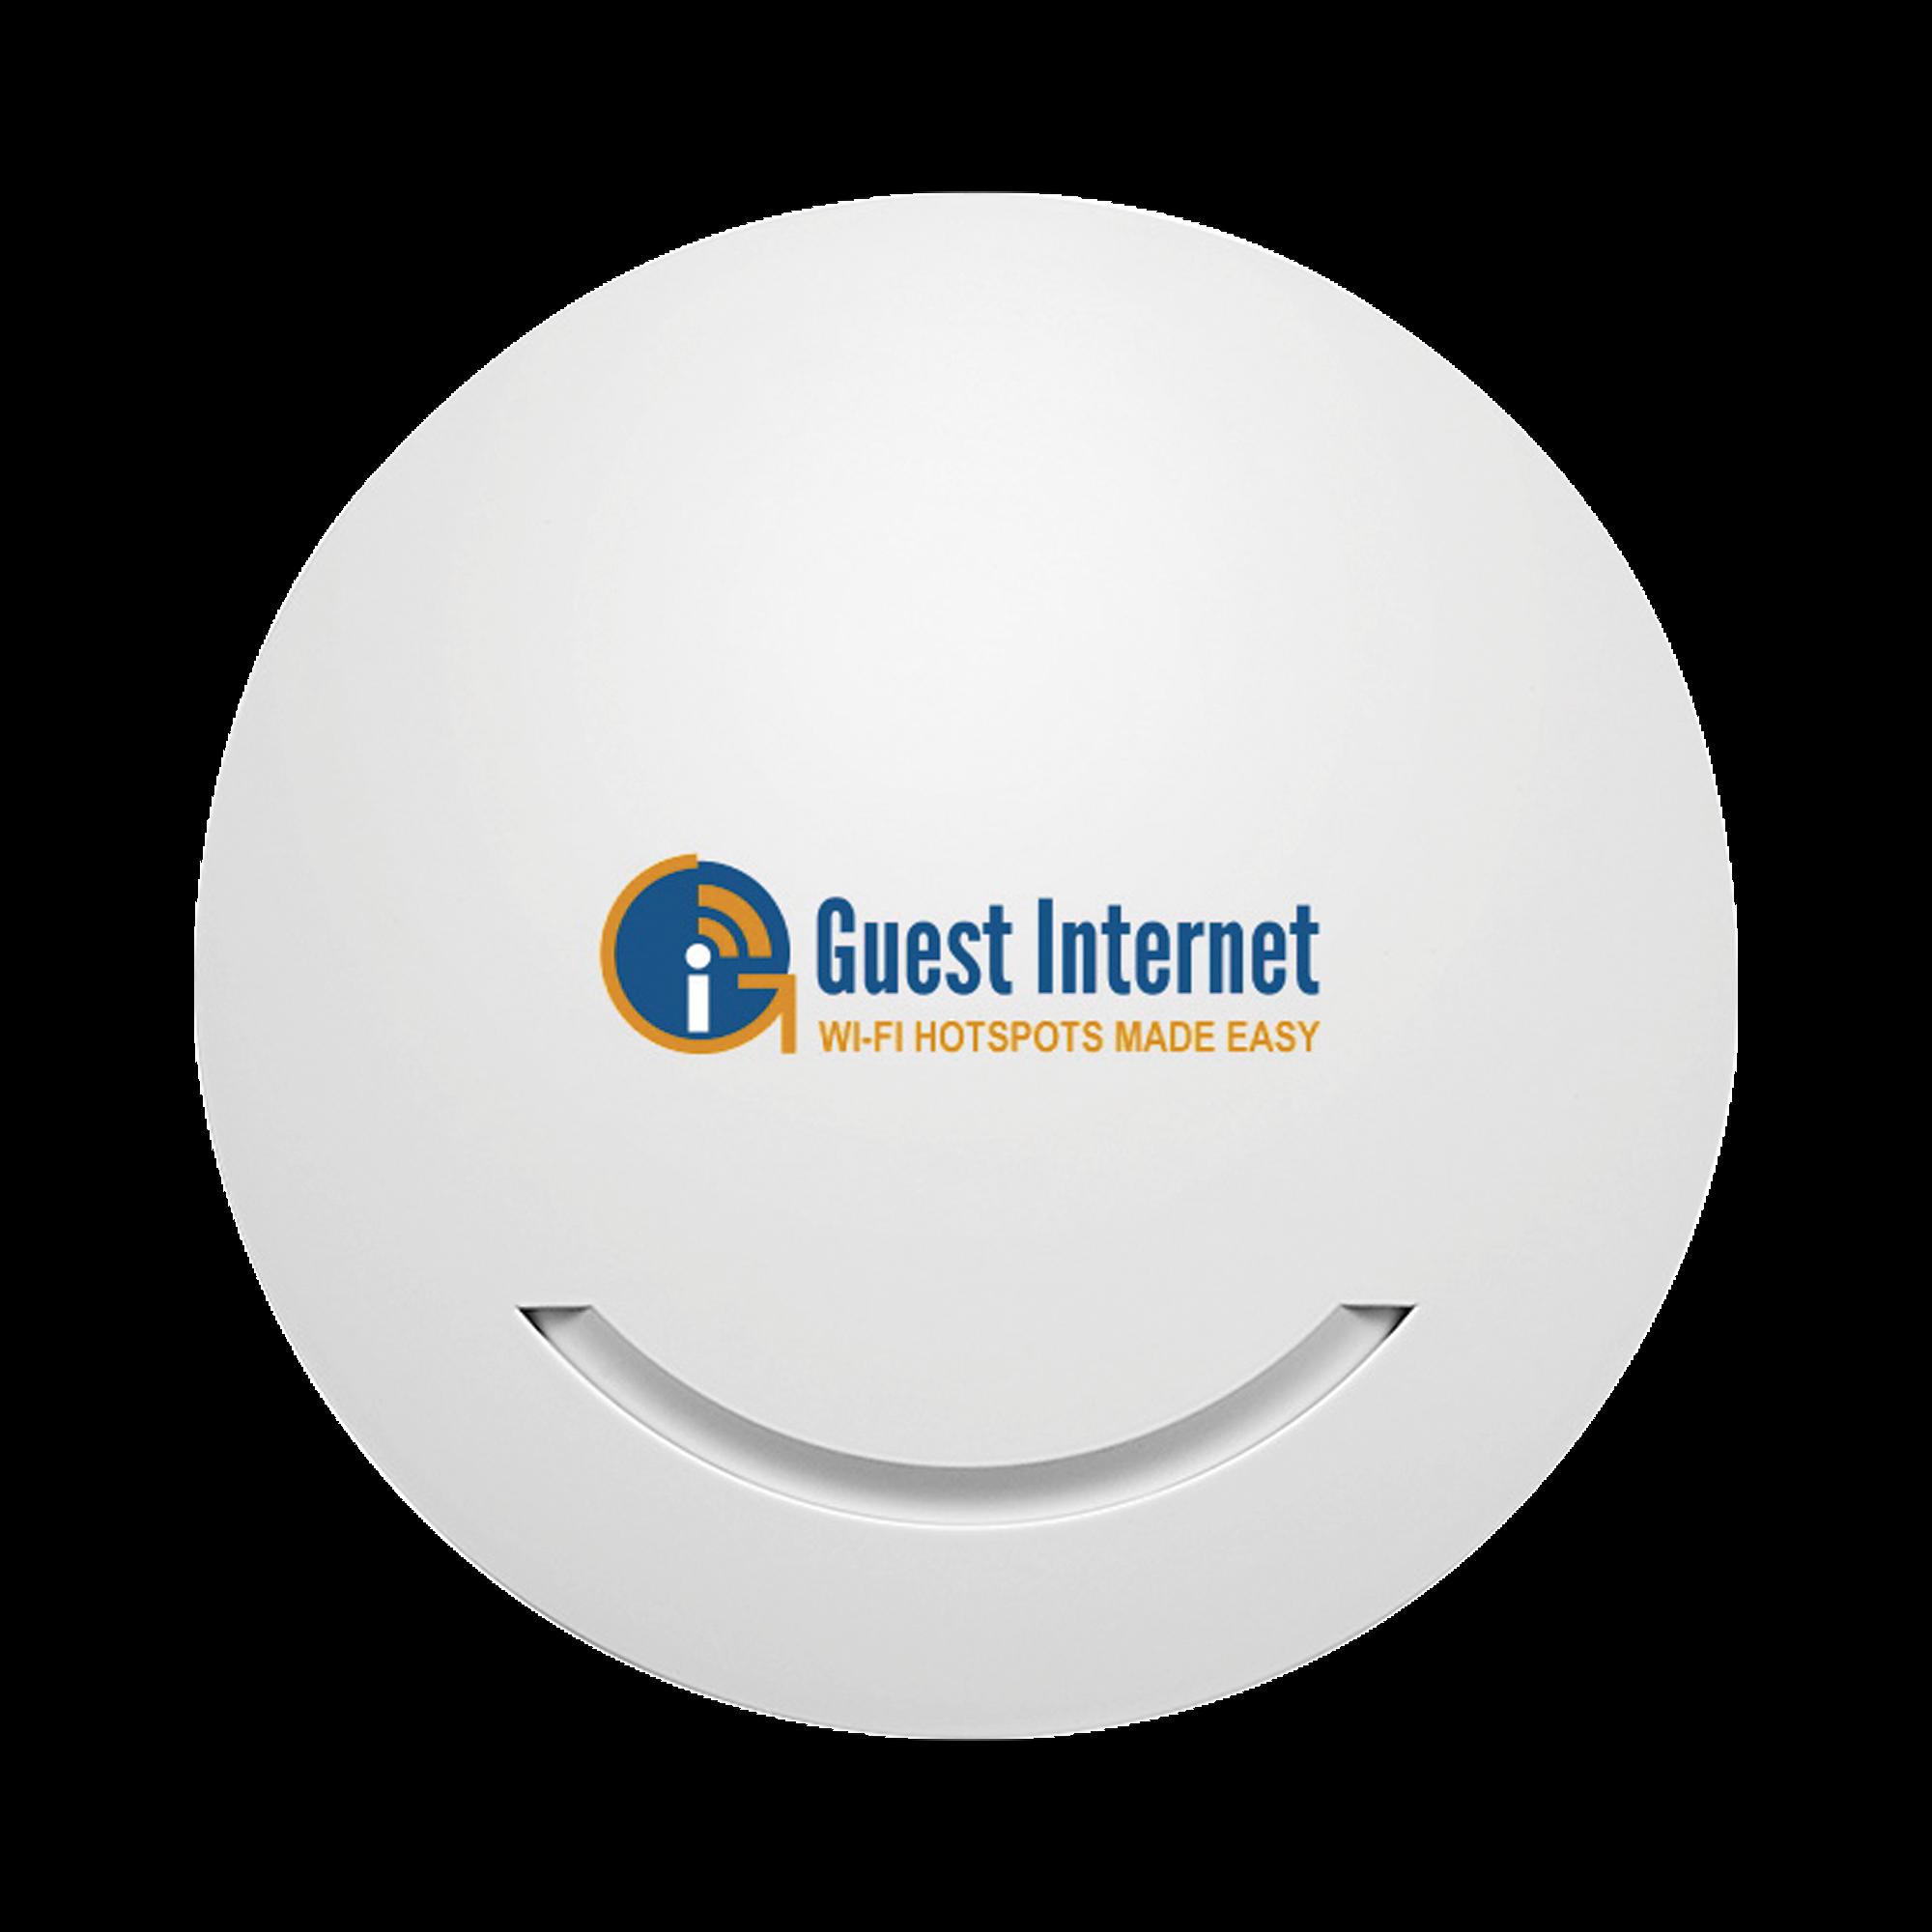 Hotspot con Punto de Acceso para usuarios concurrentes ilimitados uso en interior